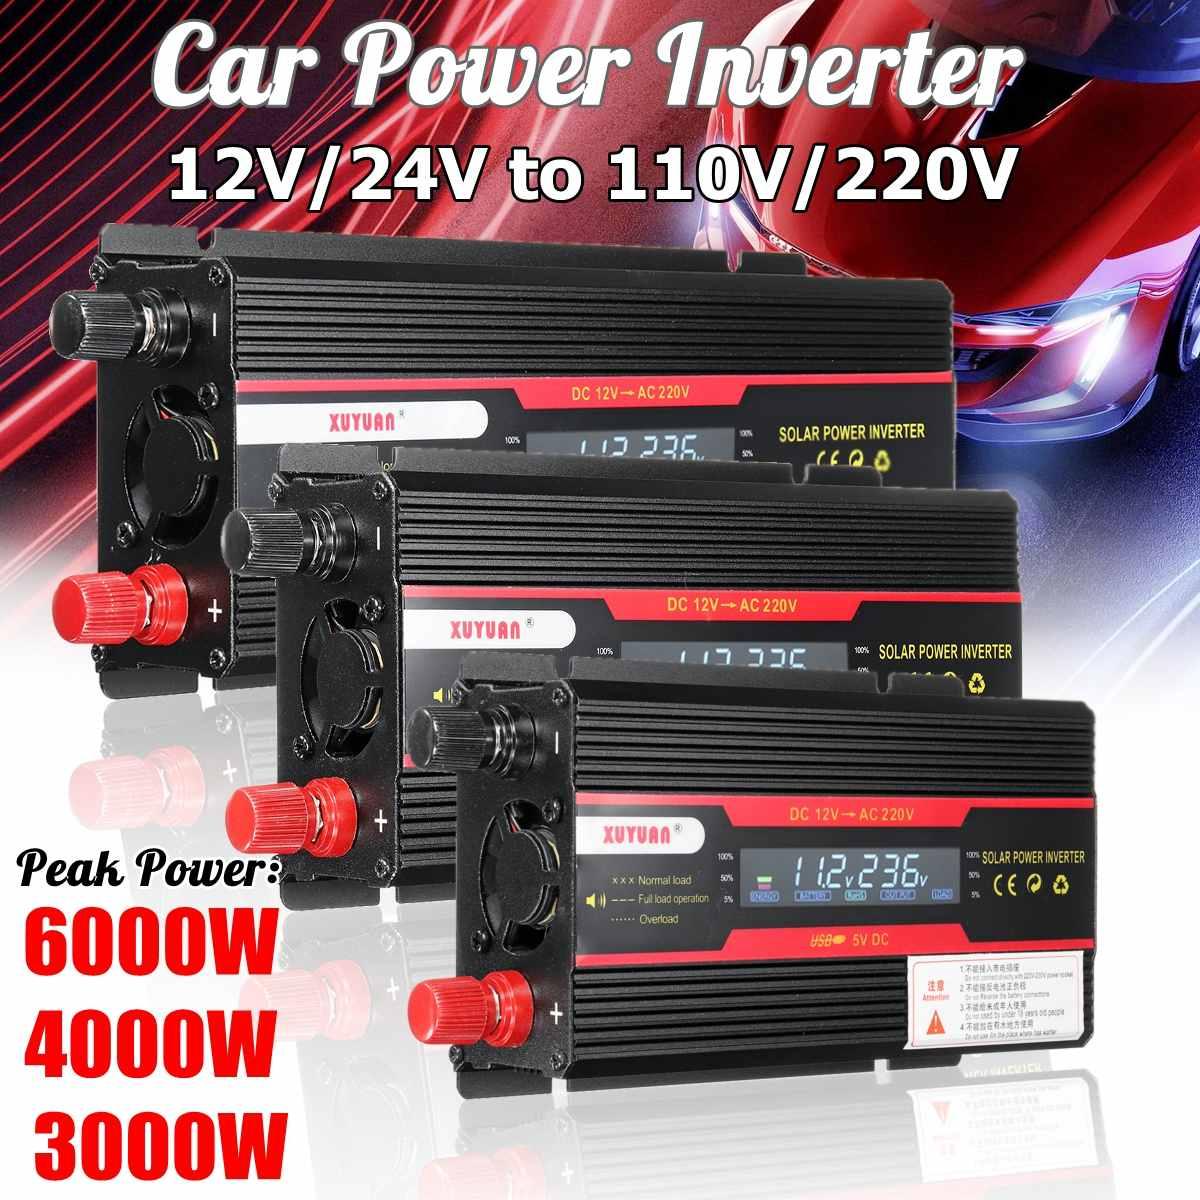 Car Inverter 12V 220V 6000W Pe ak Power Inverter Voltage Convertor Transformer 12V/24V To 110V/220V Inversor + LCD Display 17